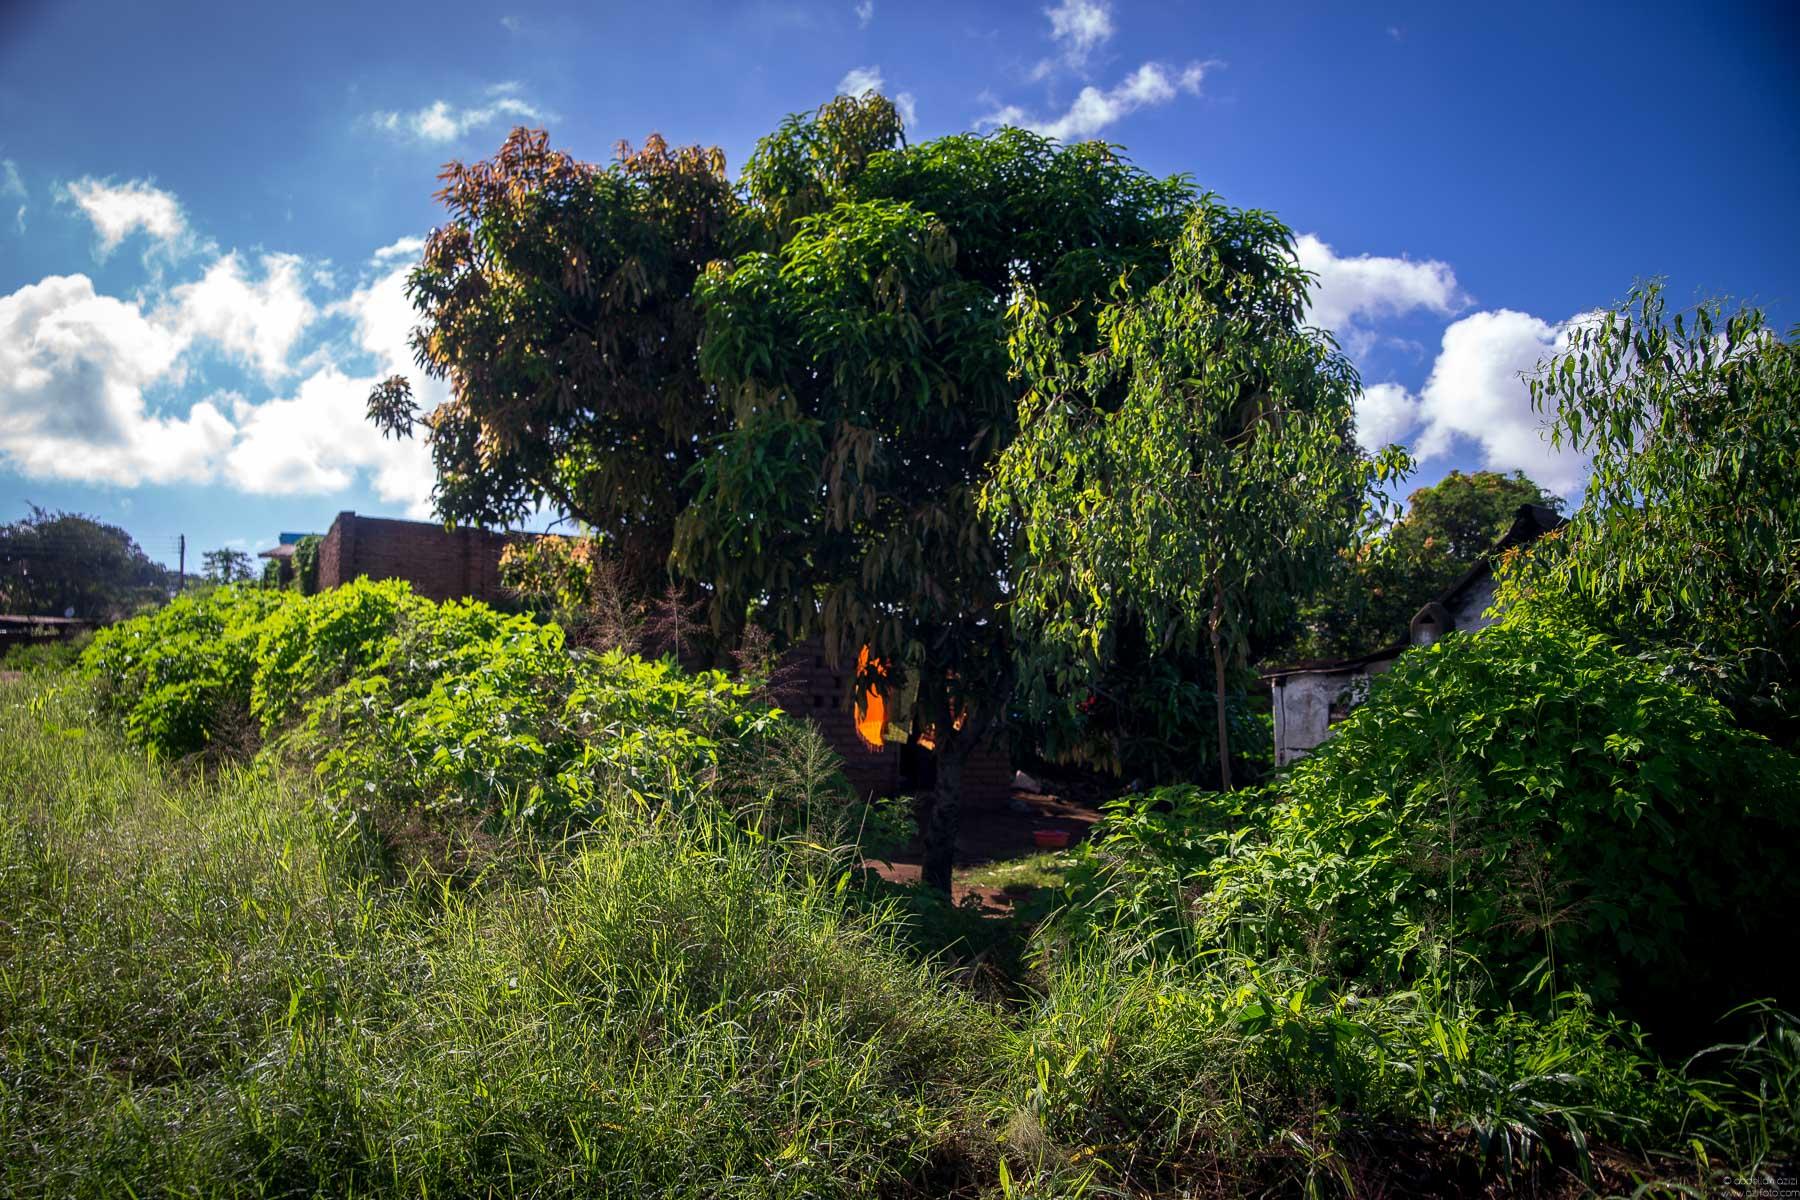 Blantyre malawi